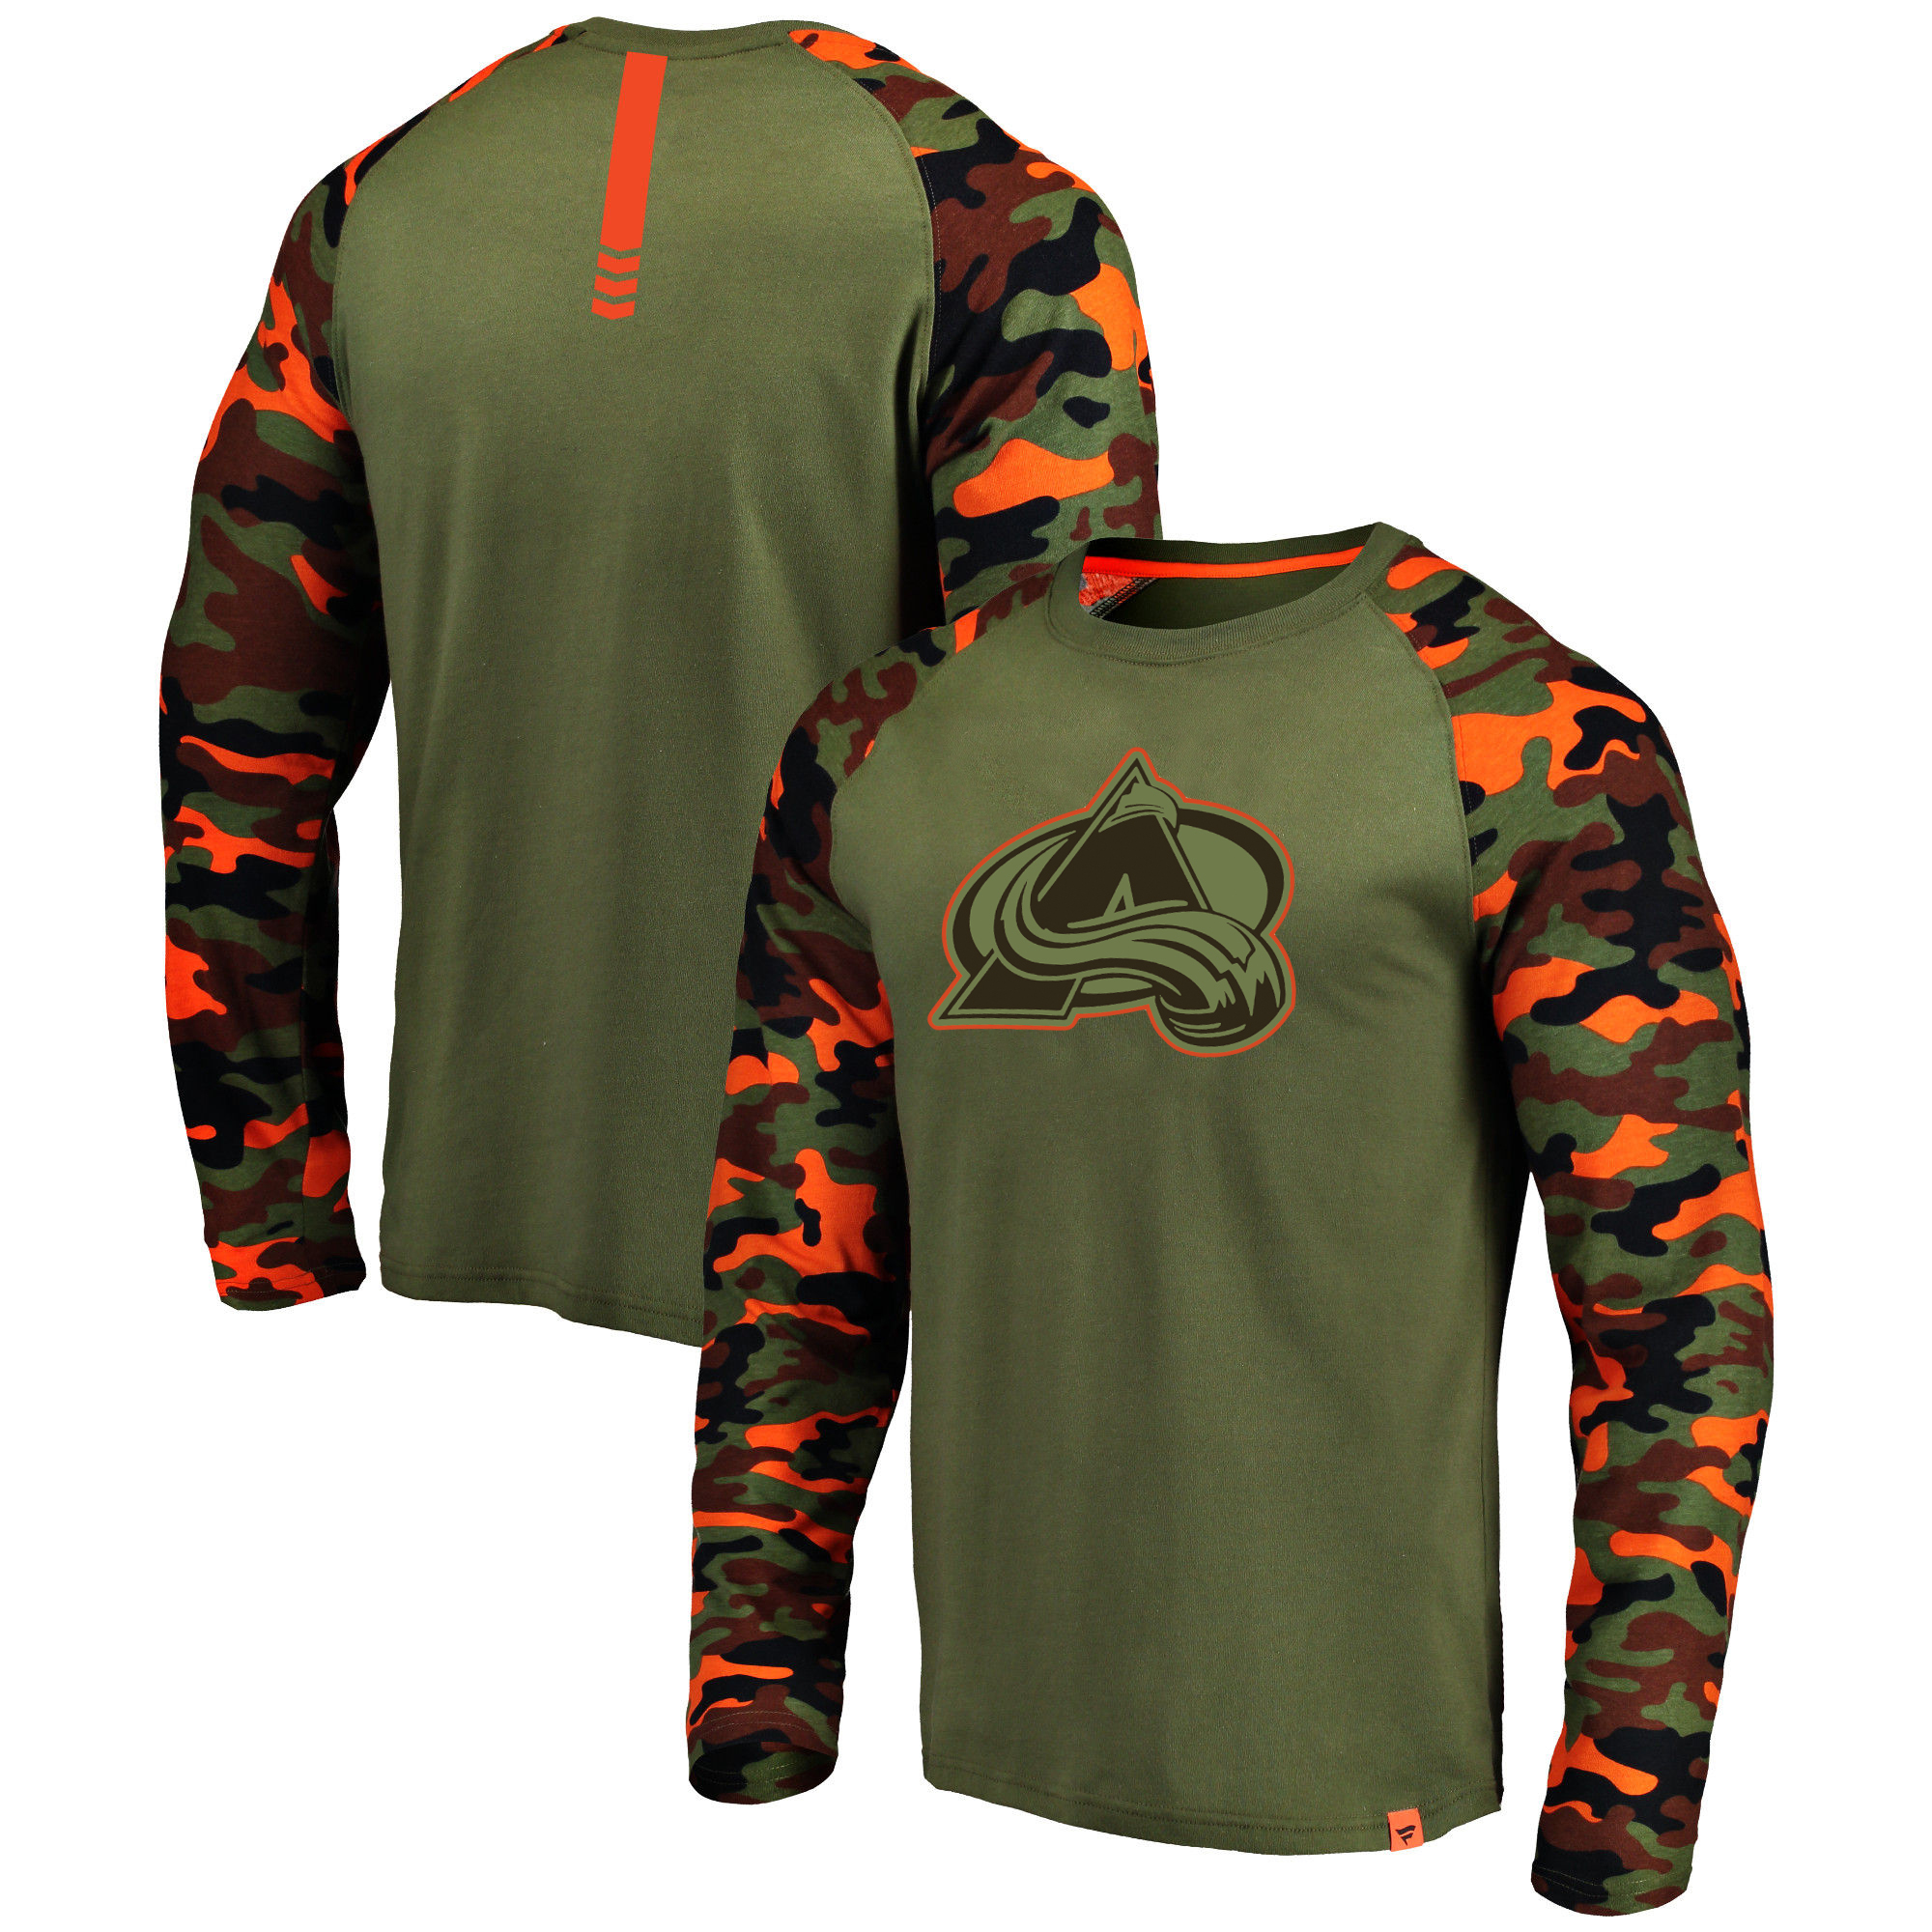 Colorado Avalanche Fanatics Branded Olive/Camo Recon Long Sleeve Raglan T-Shirt